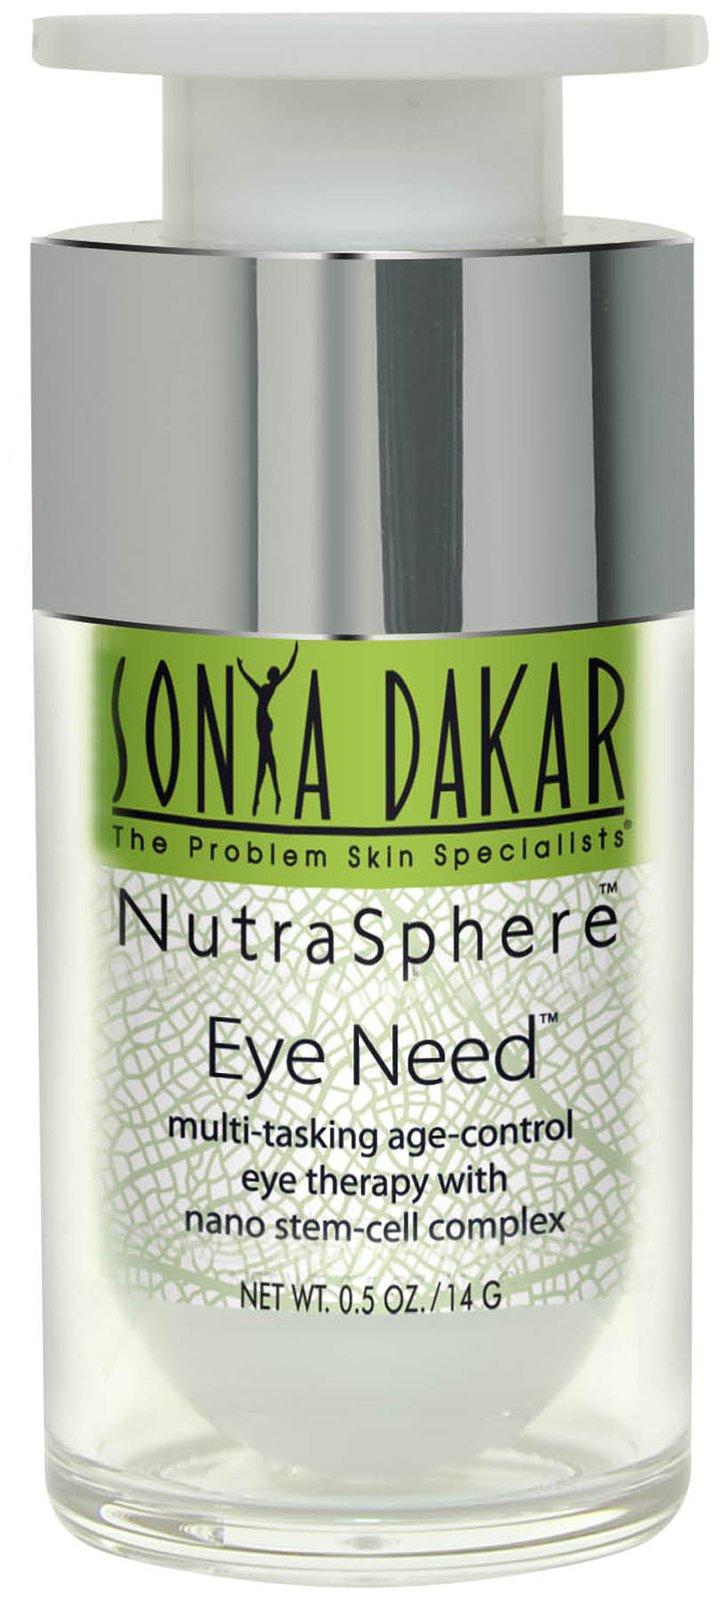 Sonya Dakar NutraSphere Eye Need